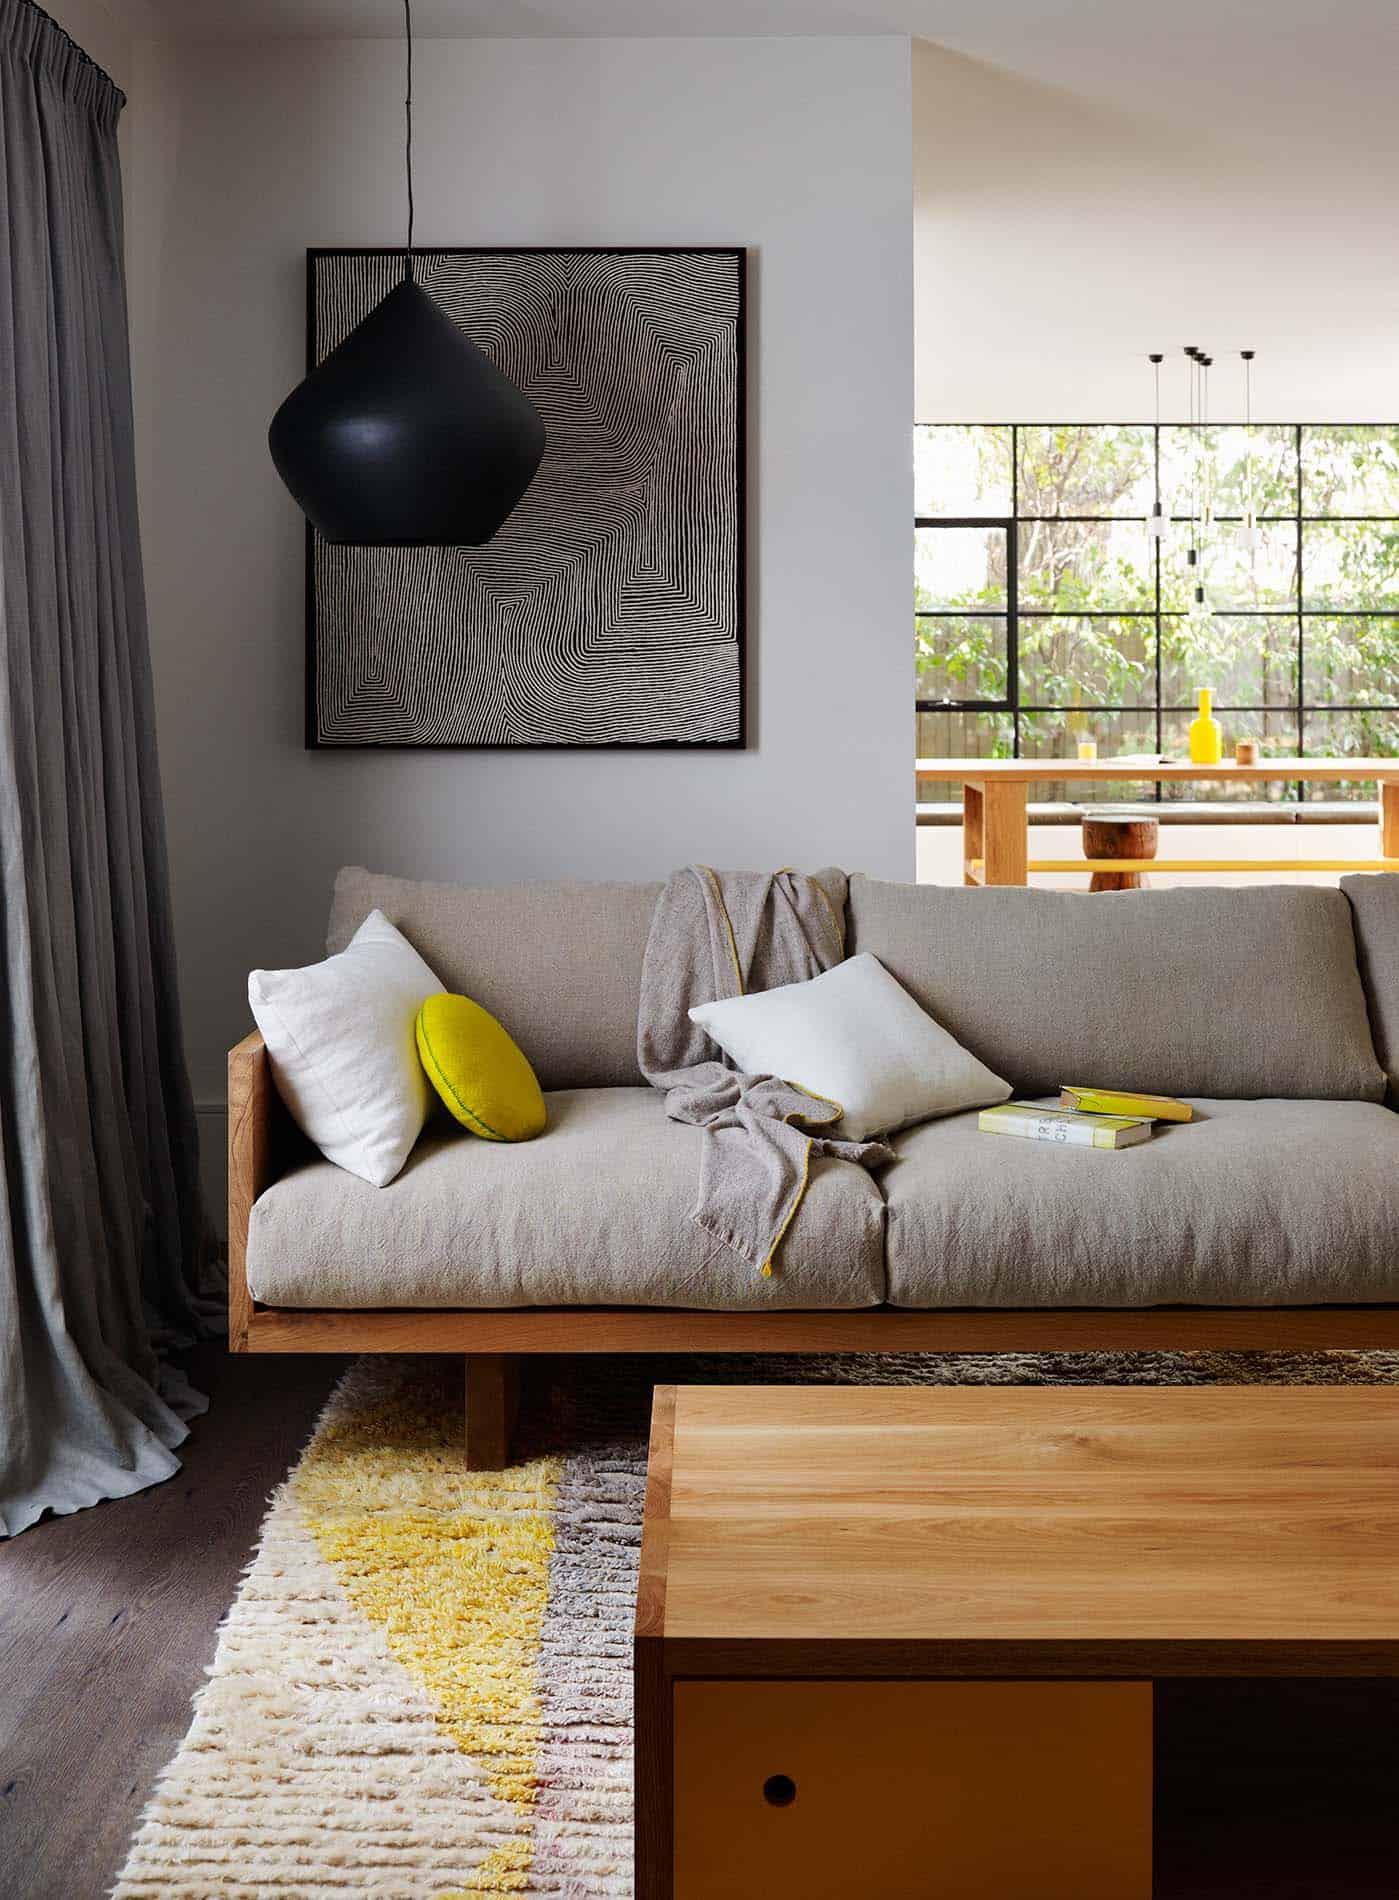 Rustic Modern Sofa Designs   Source: Mark Tuckey Plinth Sofa - Photo by Lucas Allen